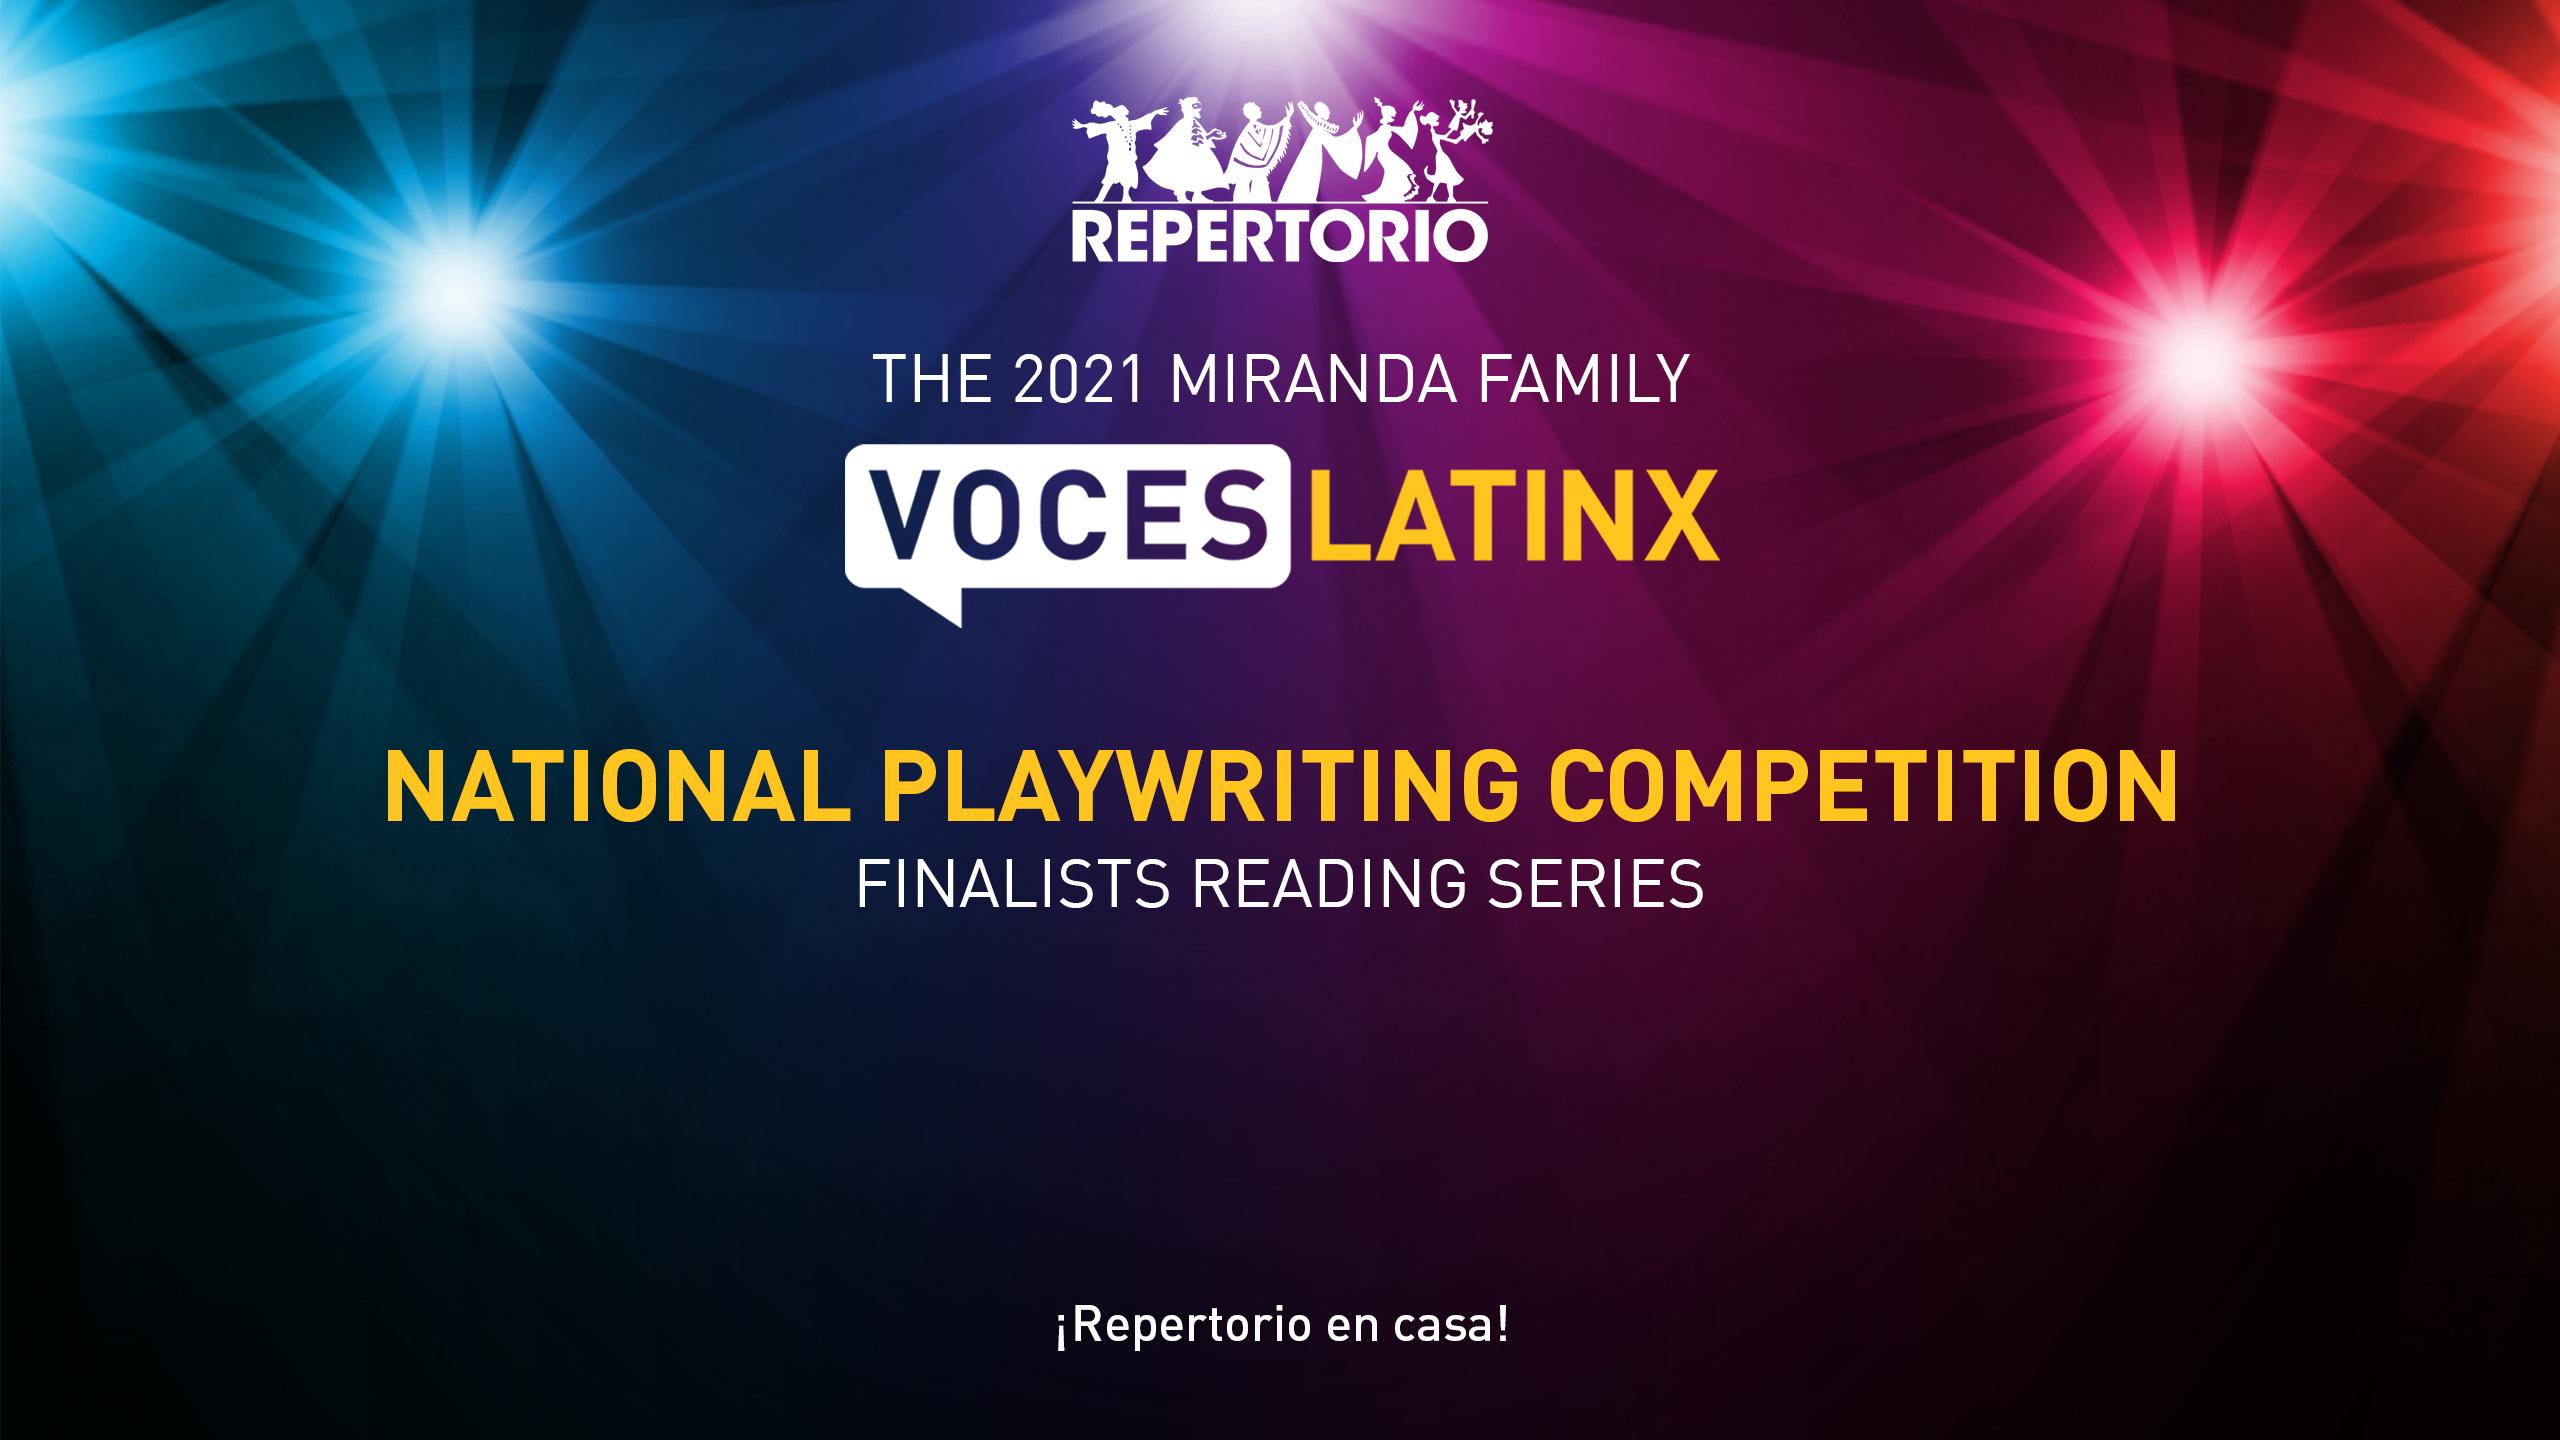 VOCES_LATINX_2021_Final